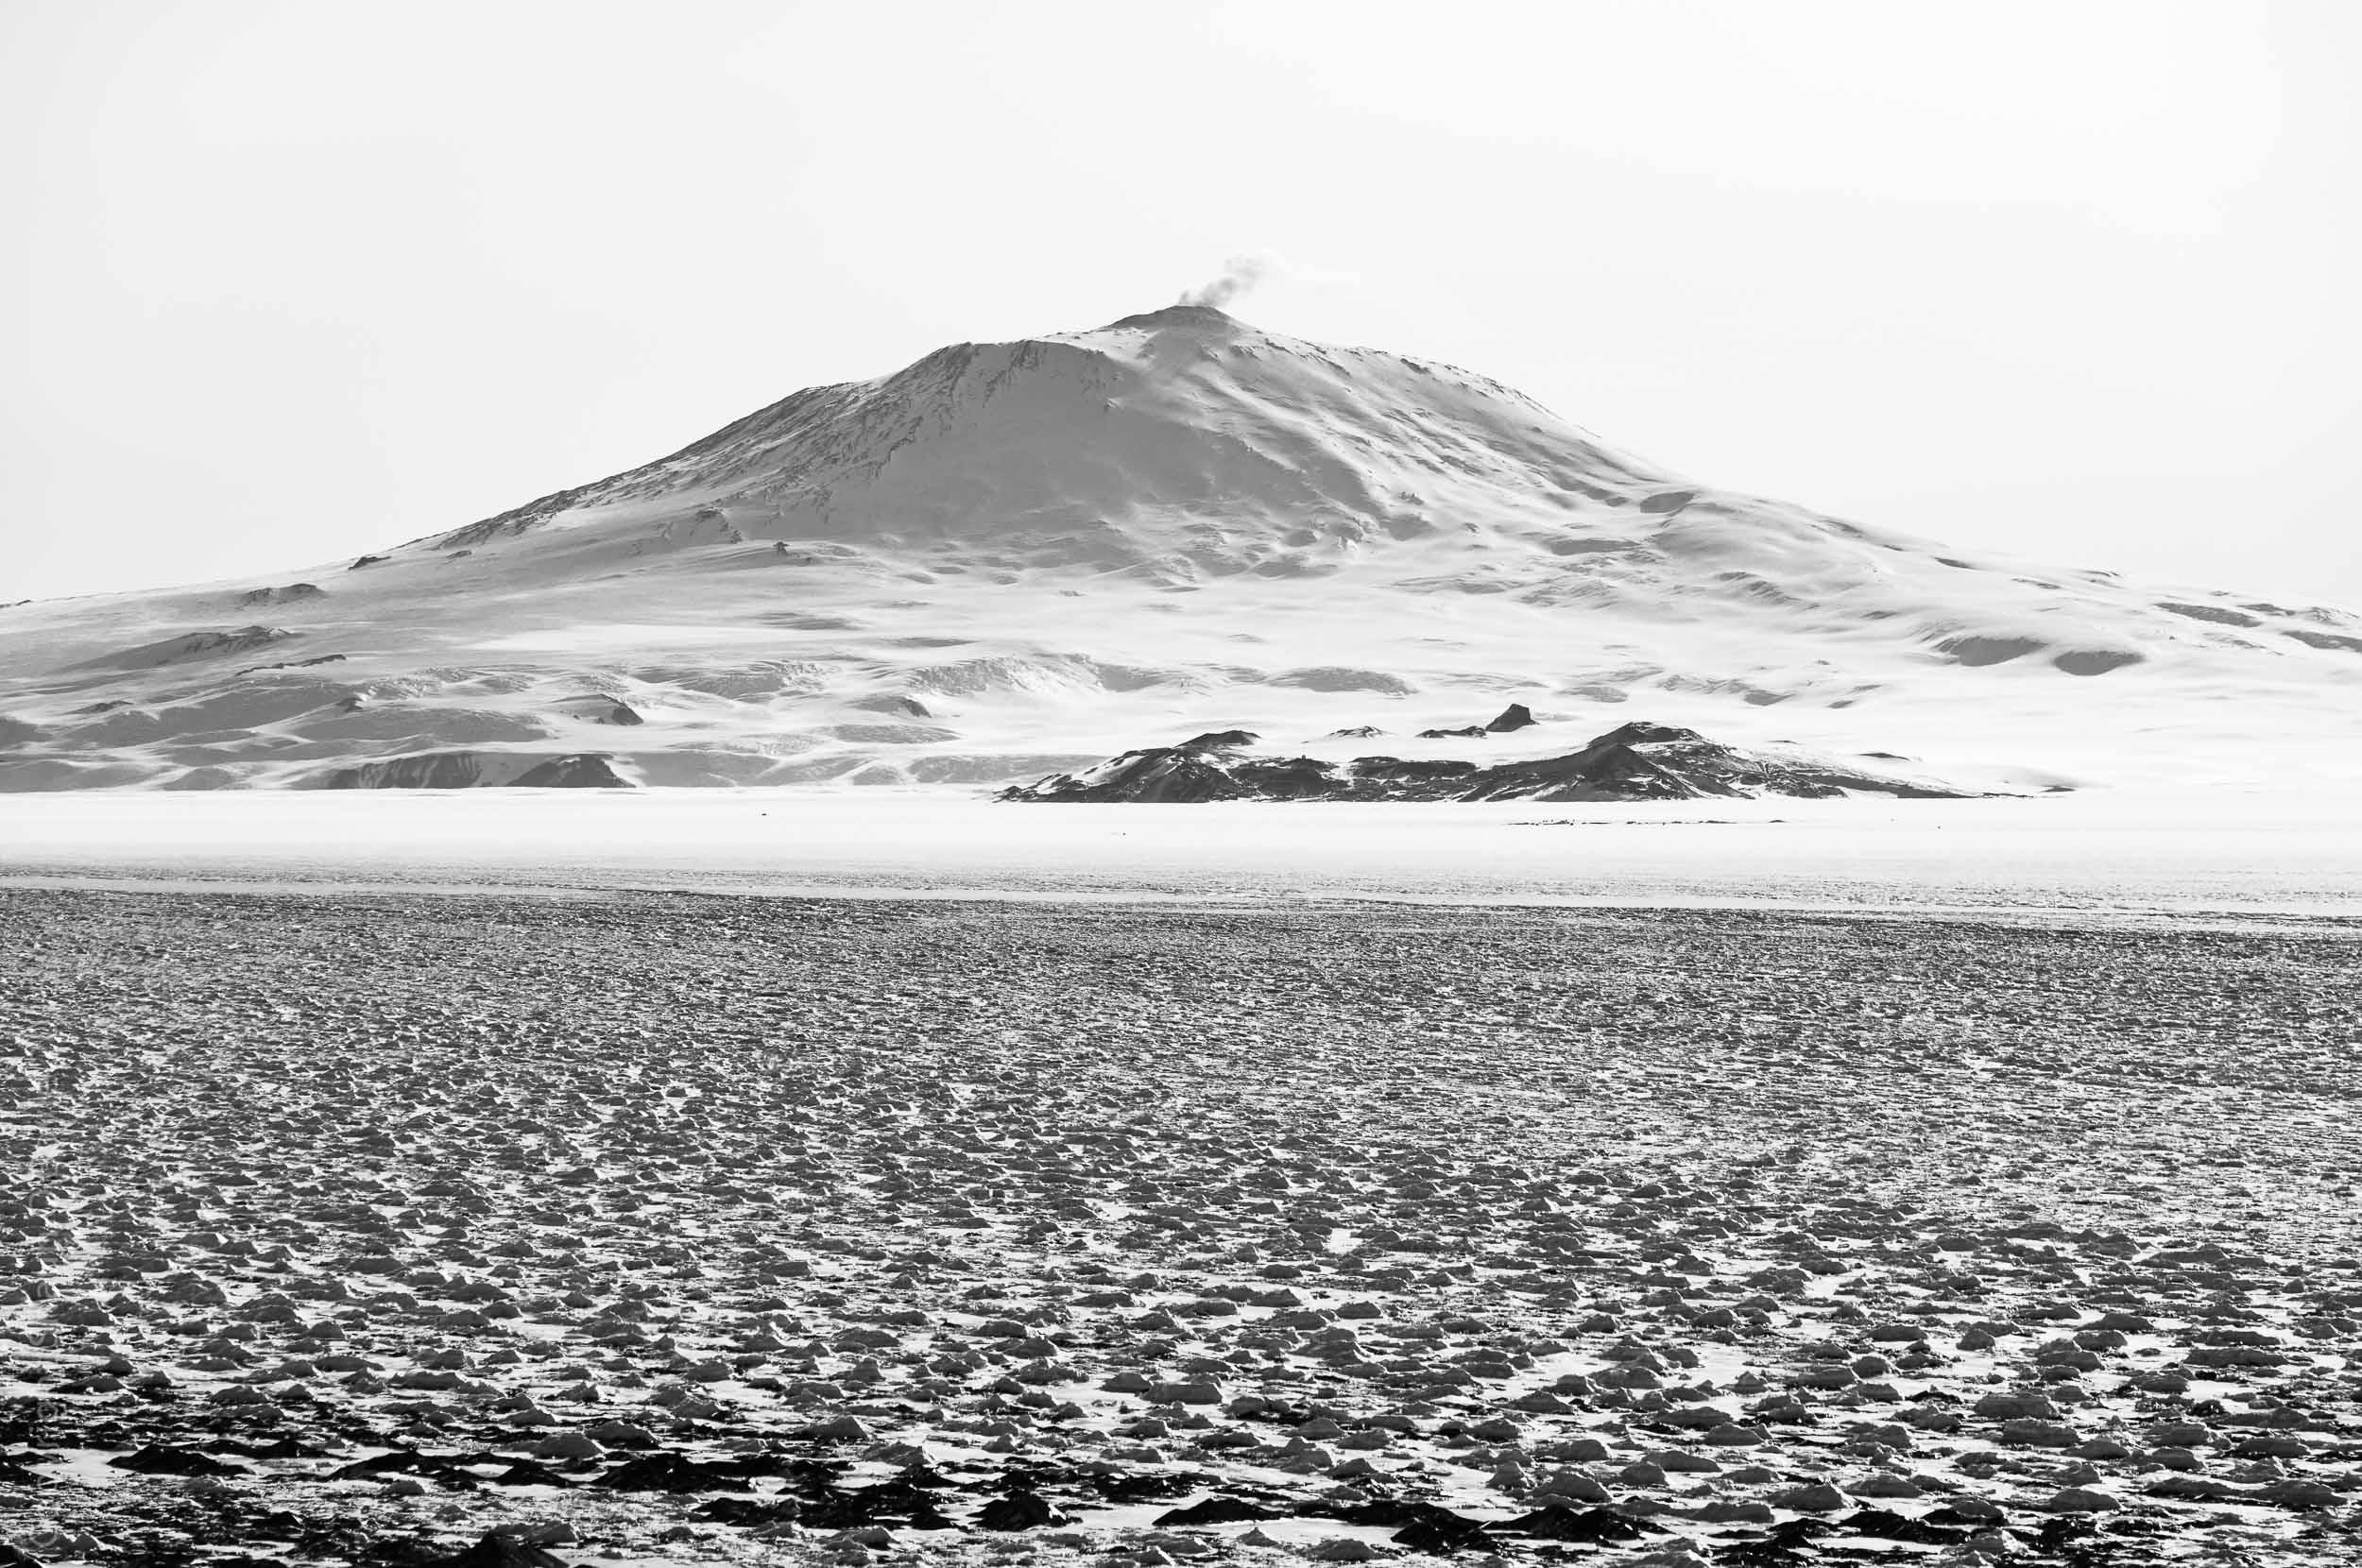 Mount Erebus from Black Island